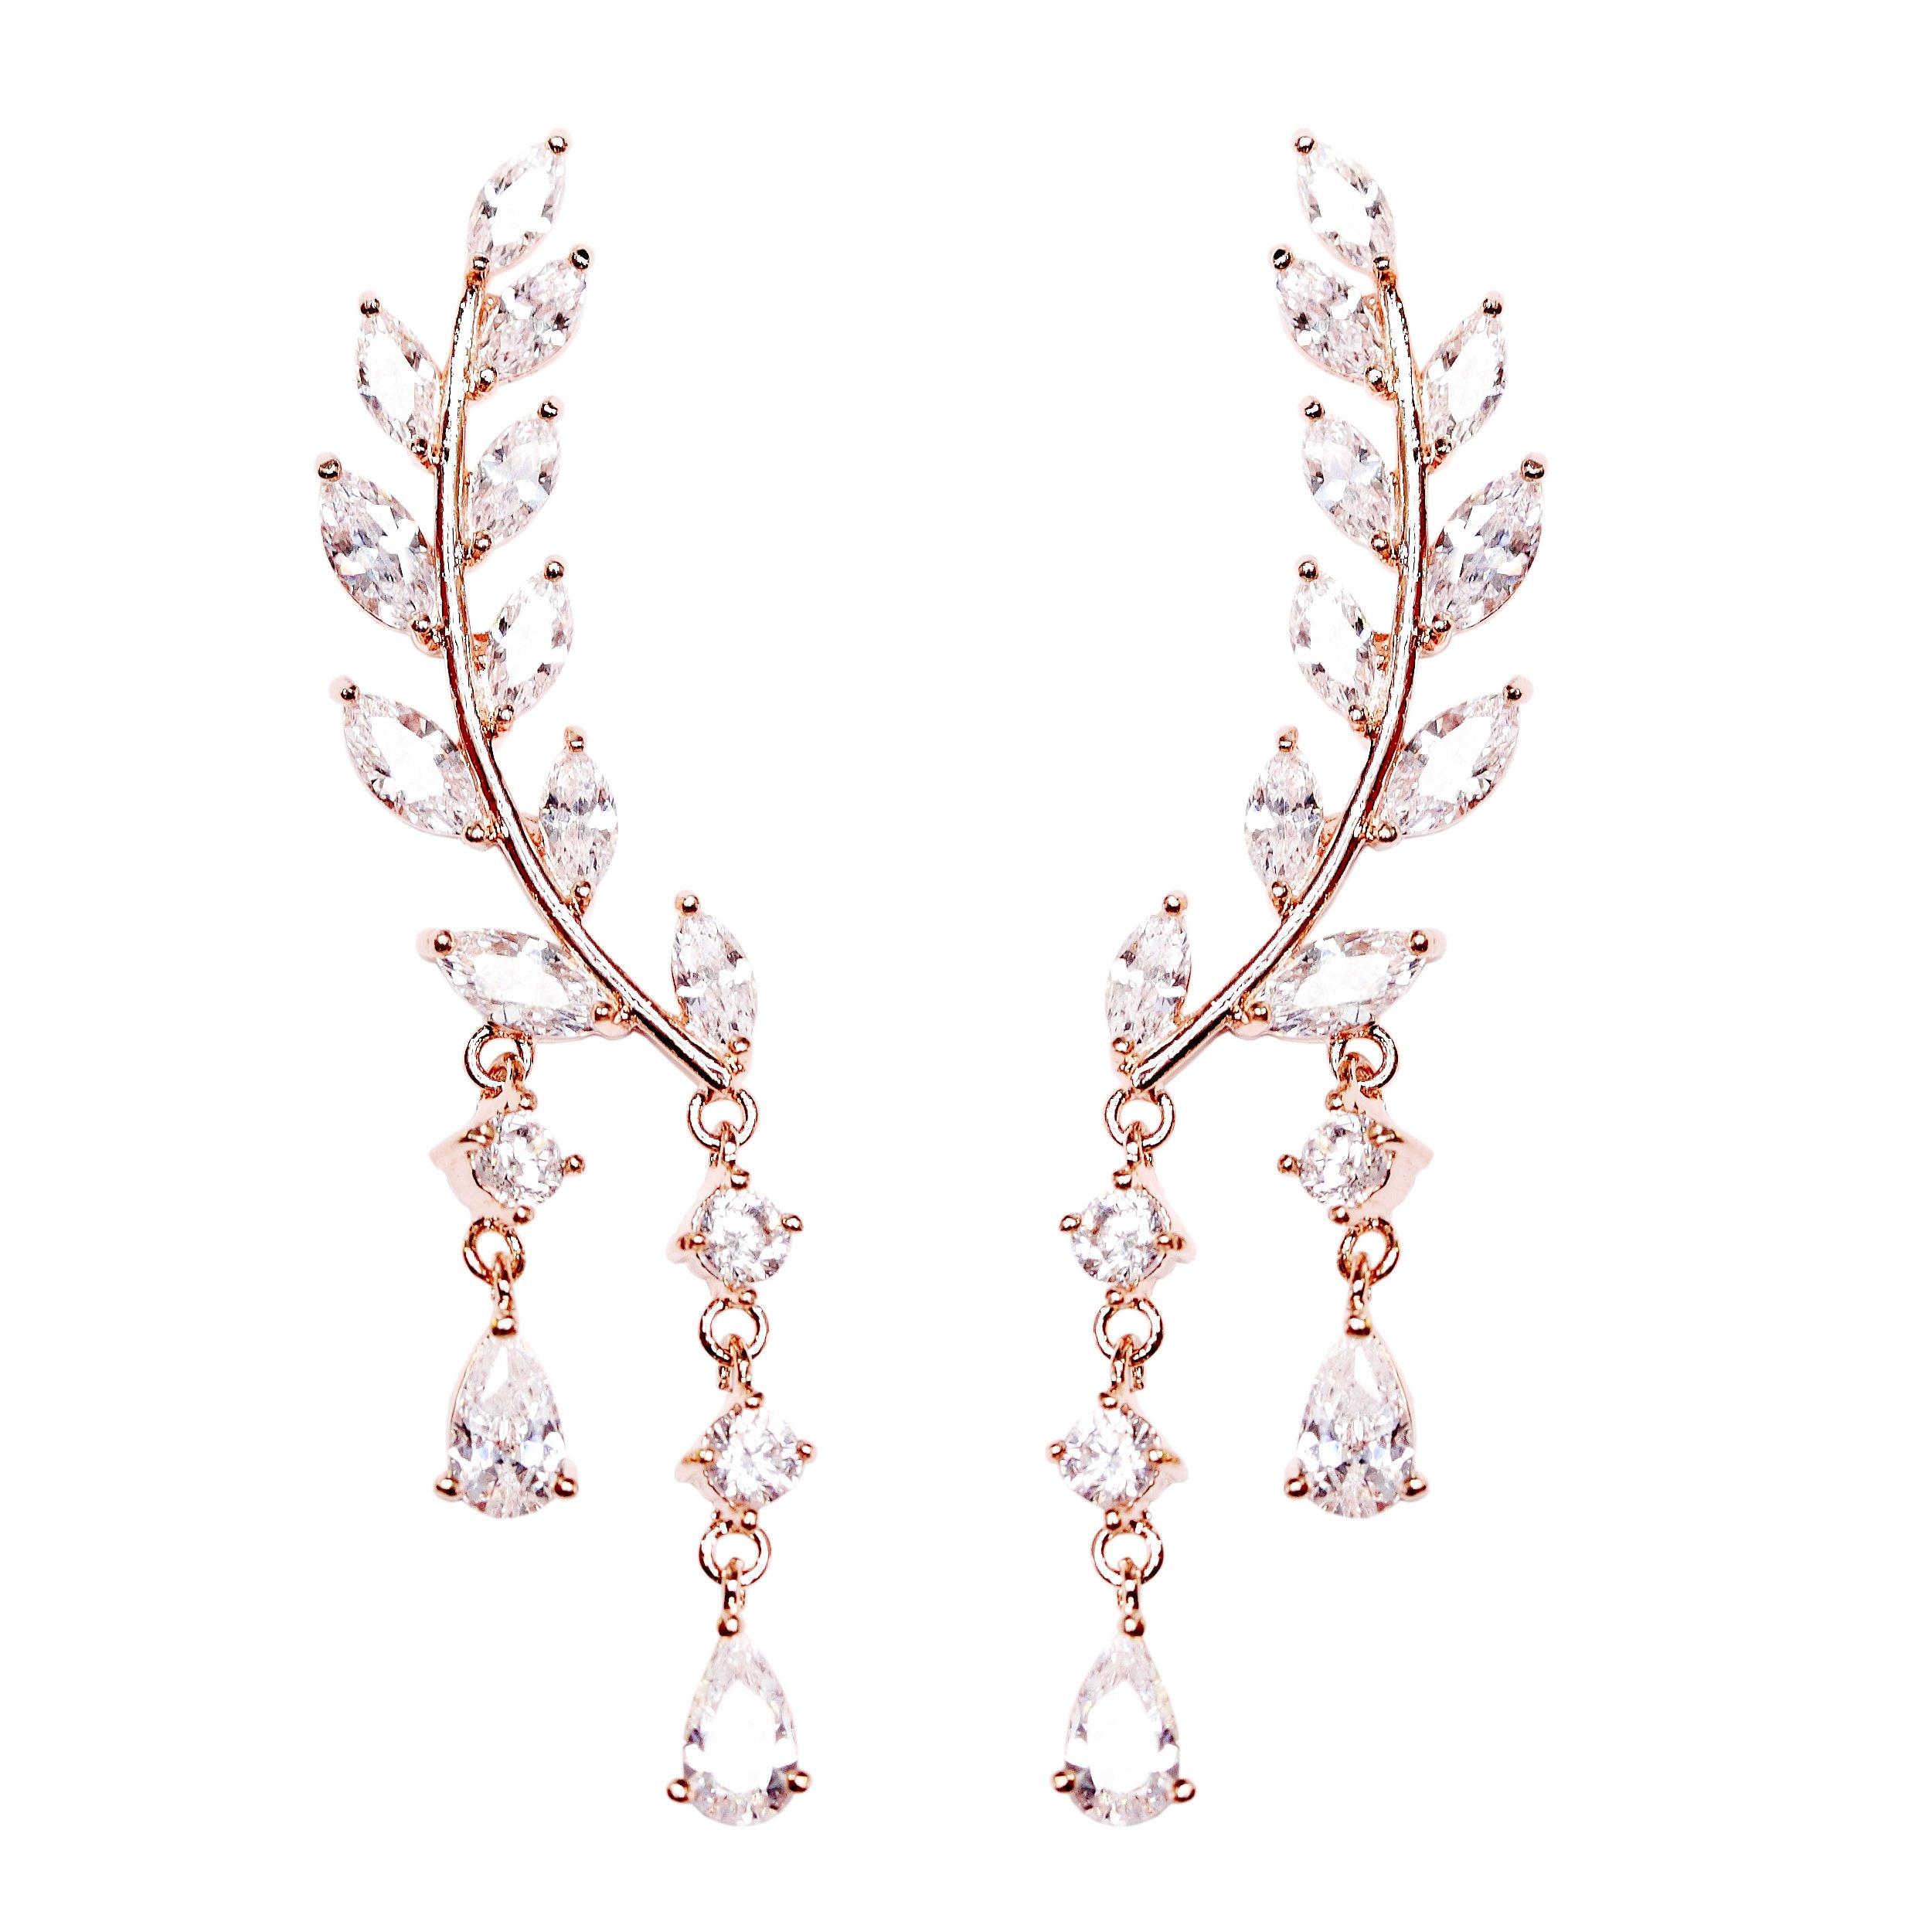 EVERU CZ Vine Jewelry Sweep Wrap Crystal Rose Gold Plated Leaf Ear Cuffs Set Stud Earrings for Women by EVERU